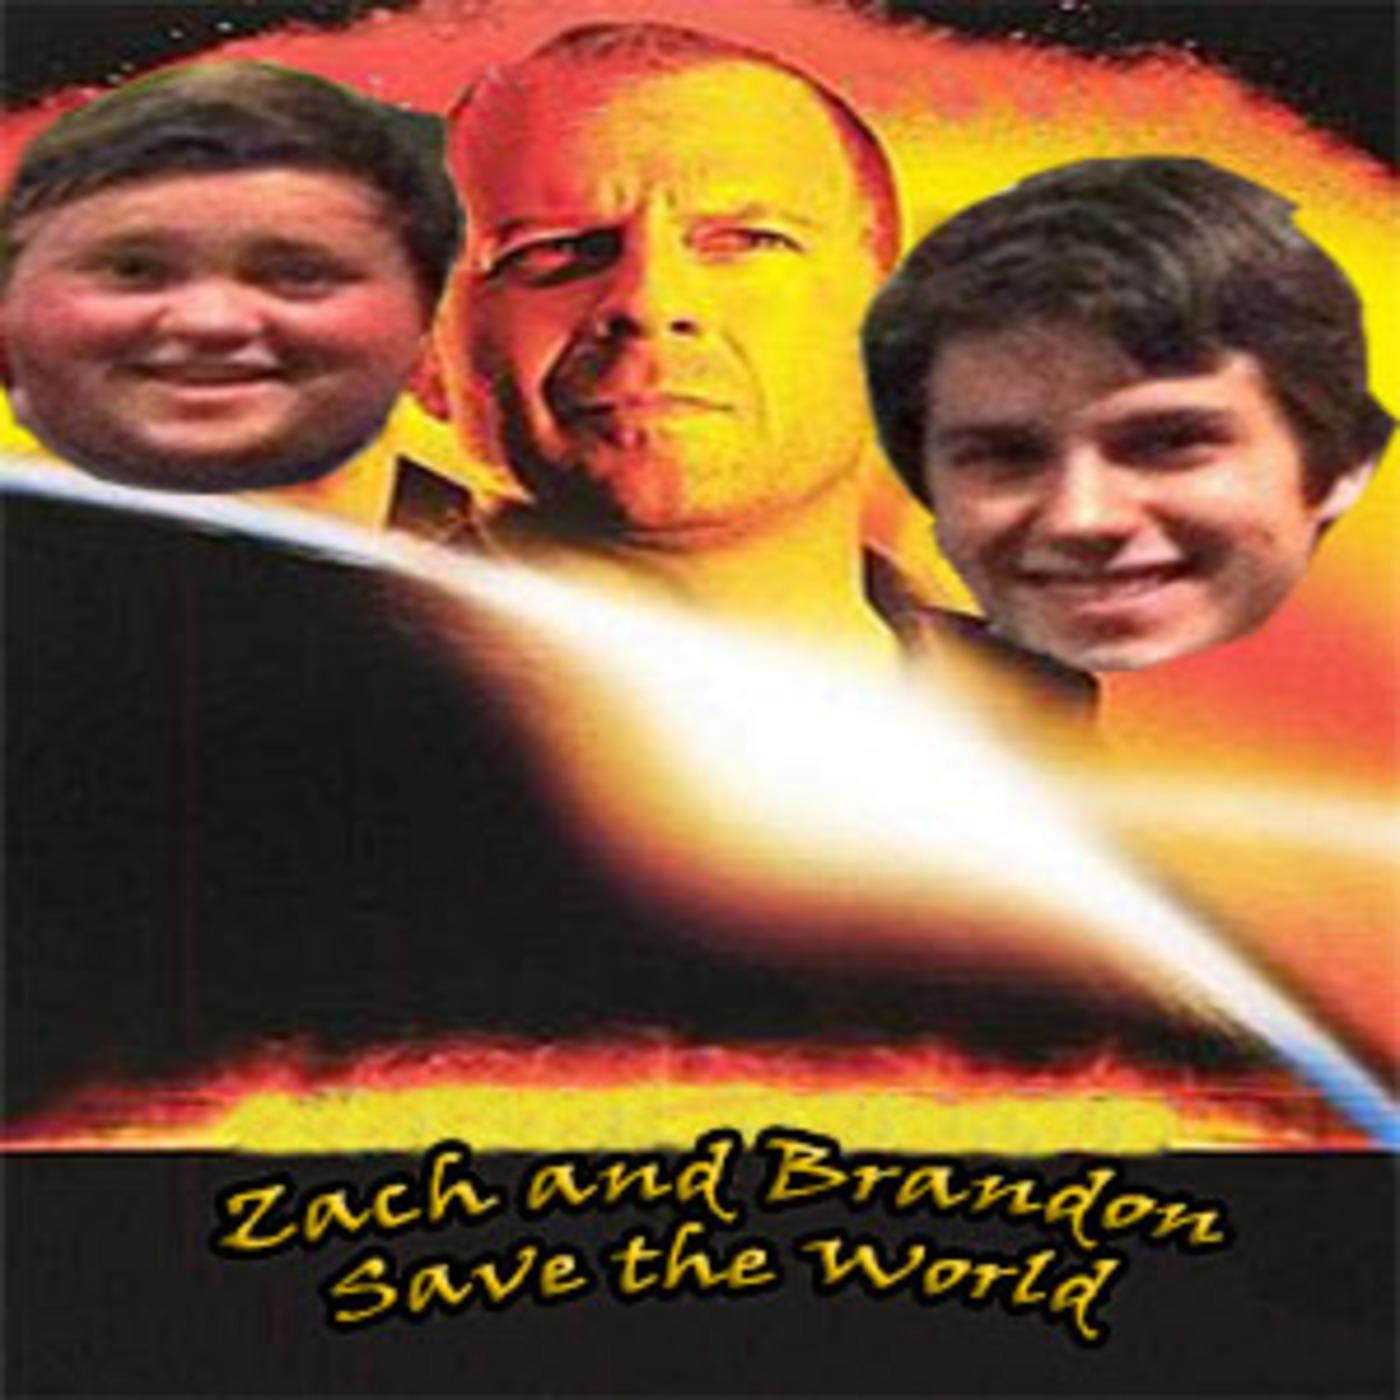 Zach and Brandon Save the World